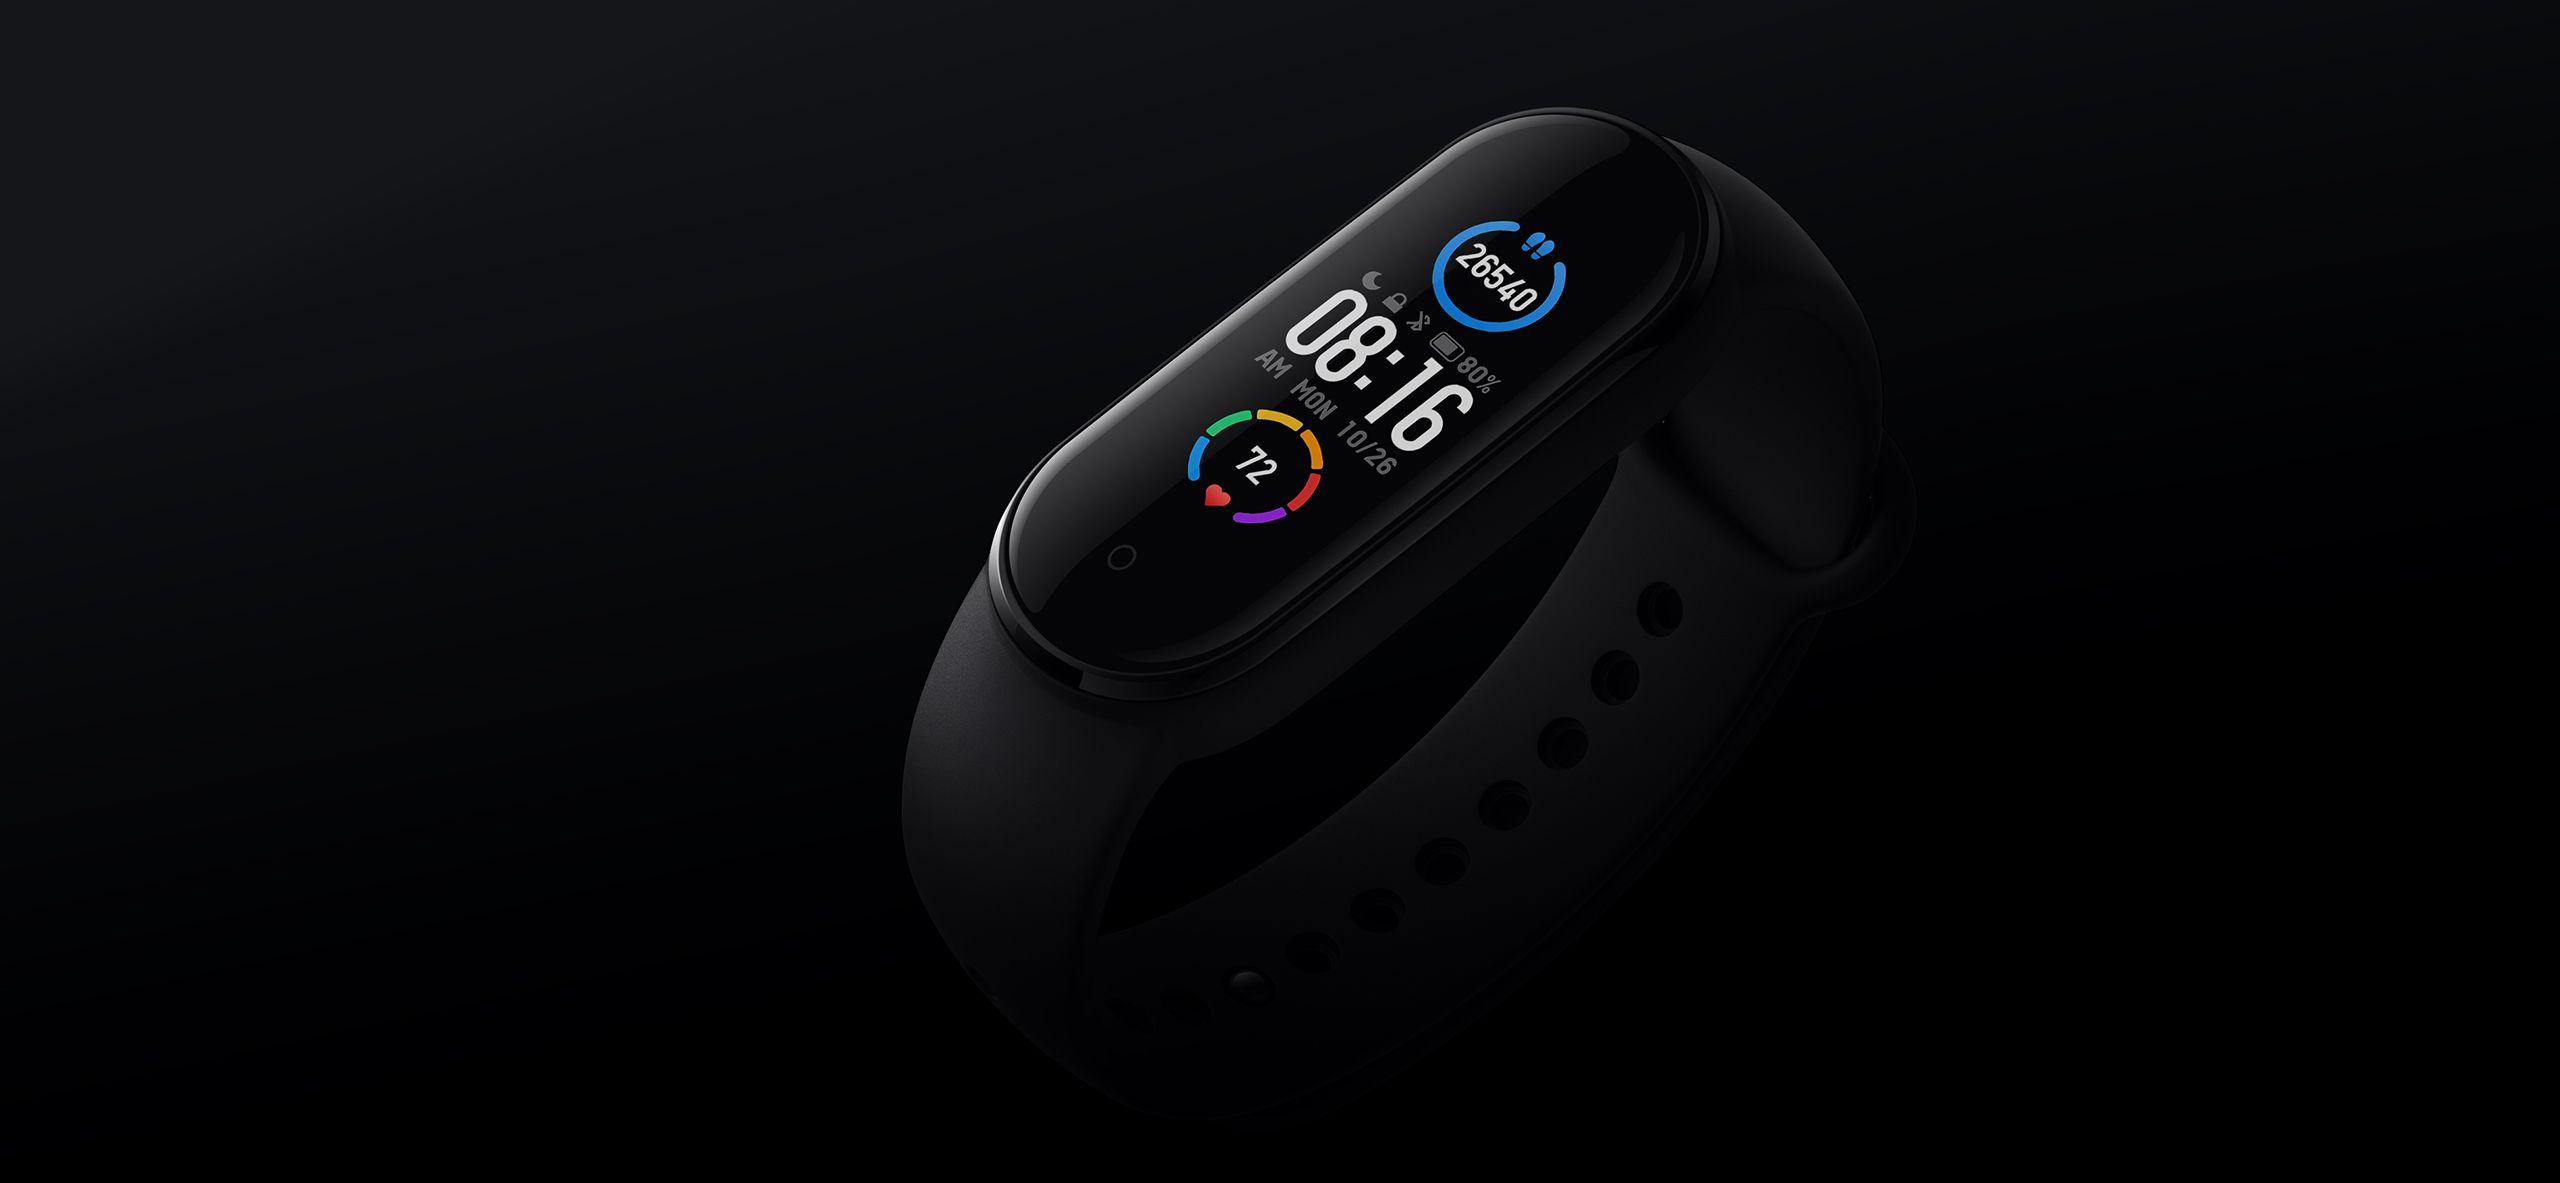 Xiaomi Mi Smart band 5 NFC дисплей